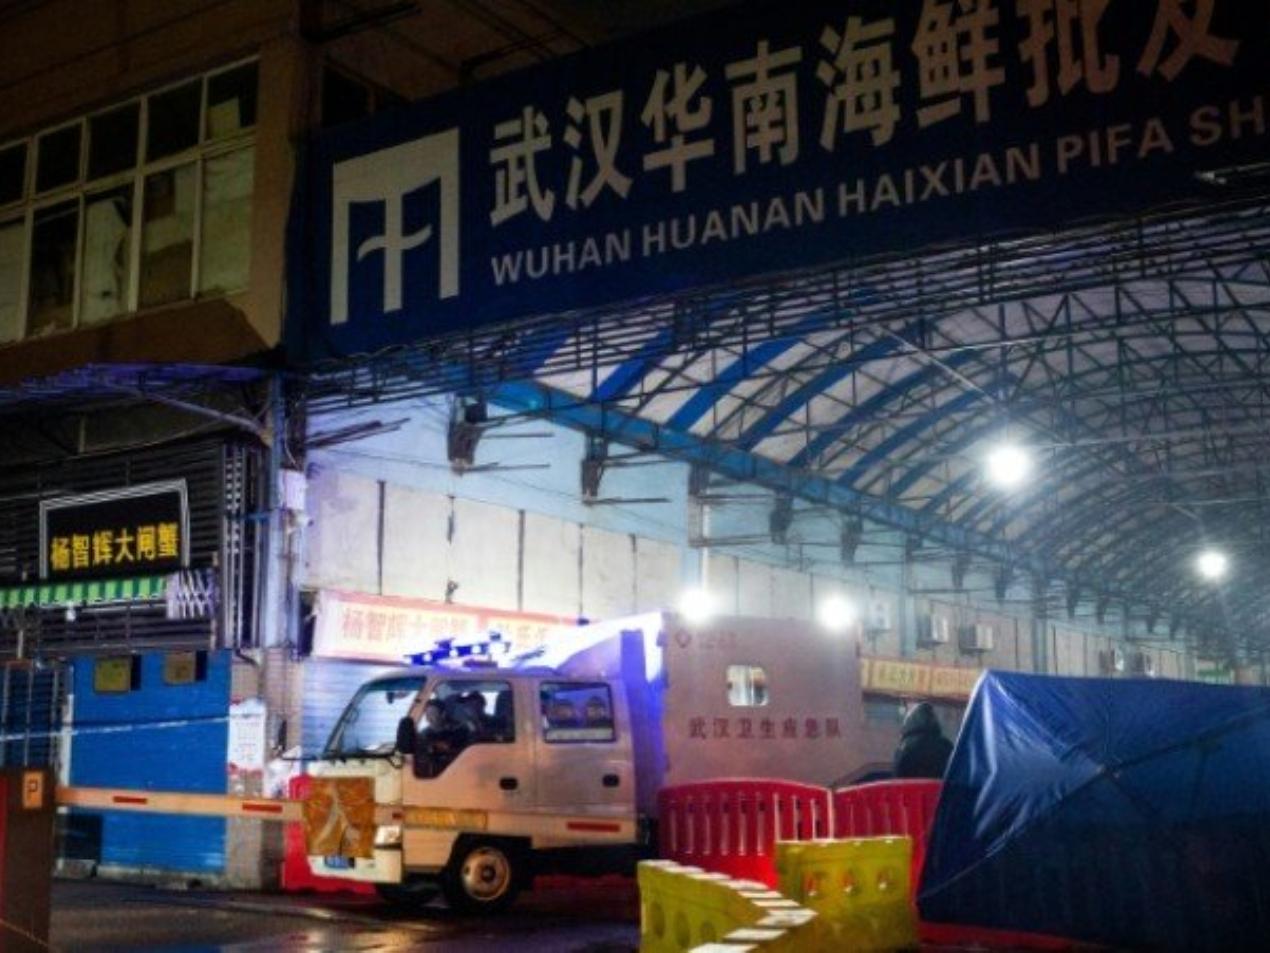 Wuhan starts screening roads to contain virus